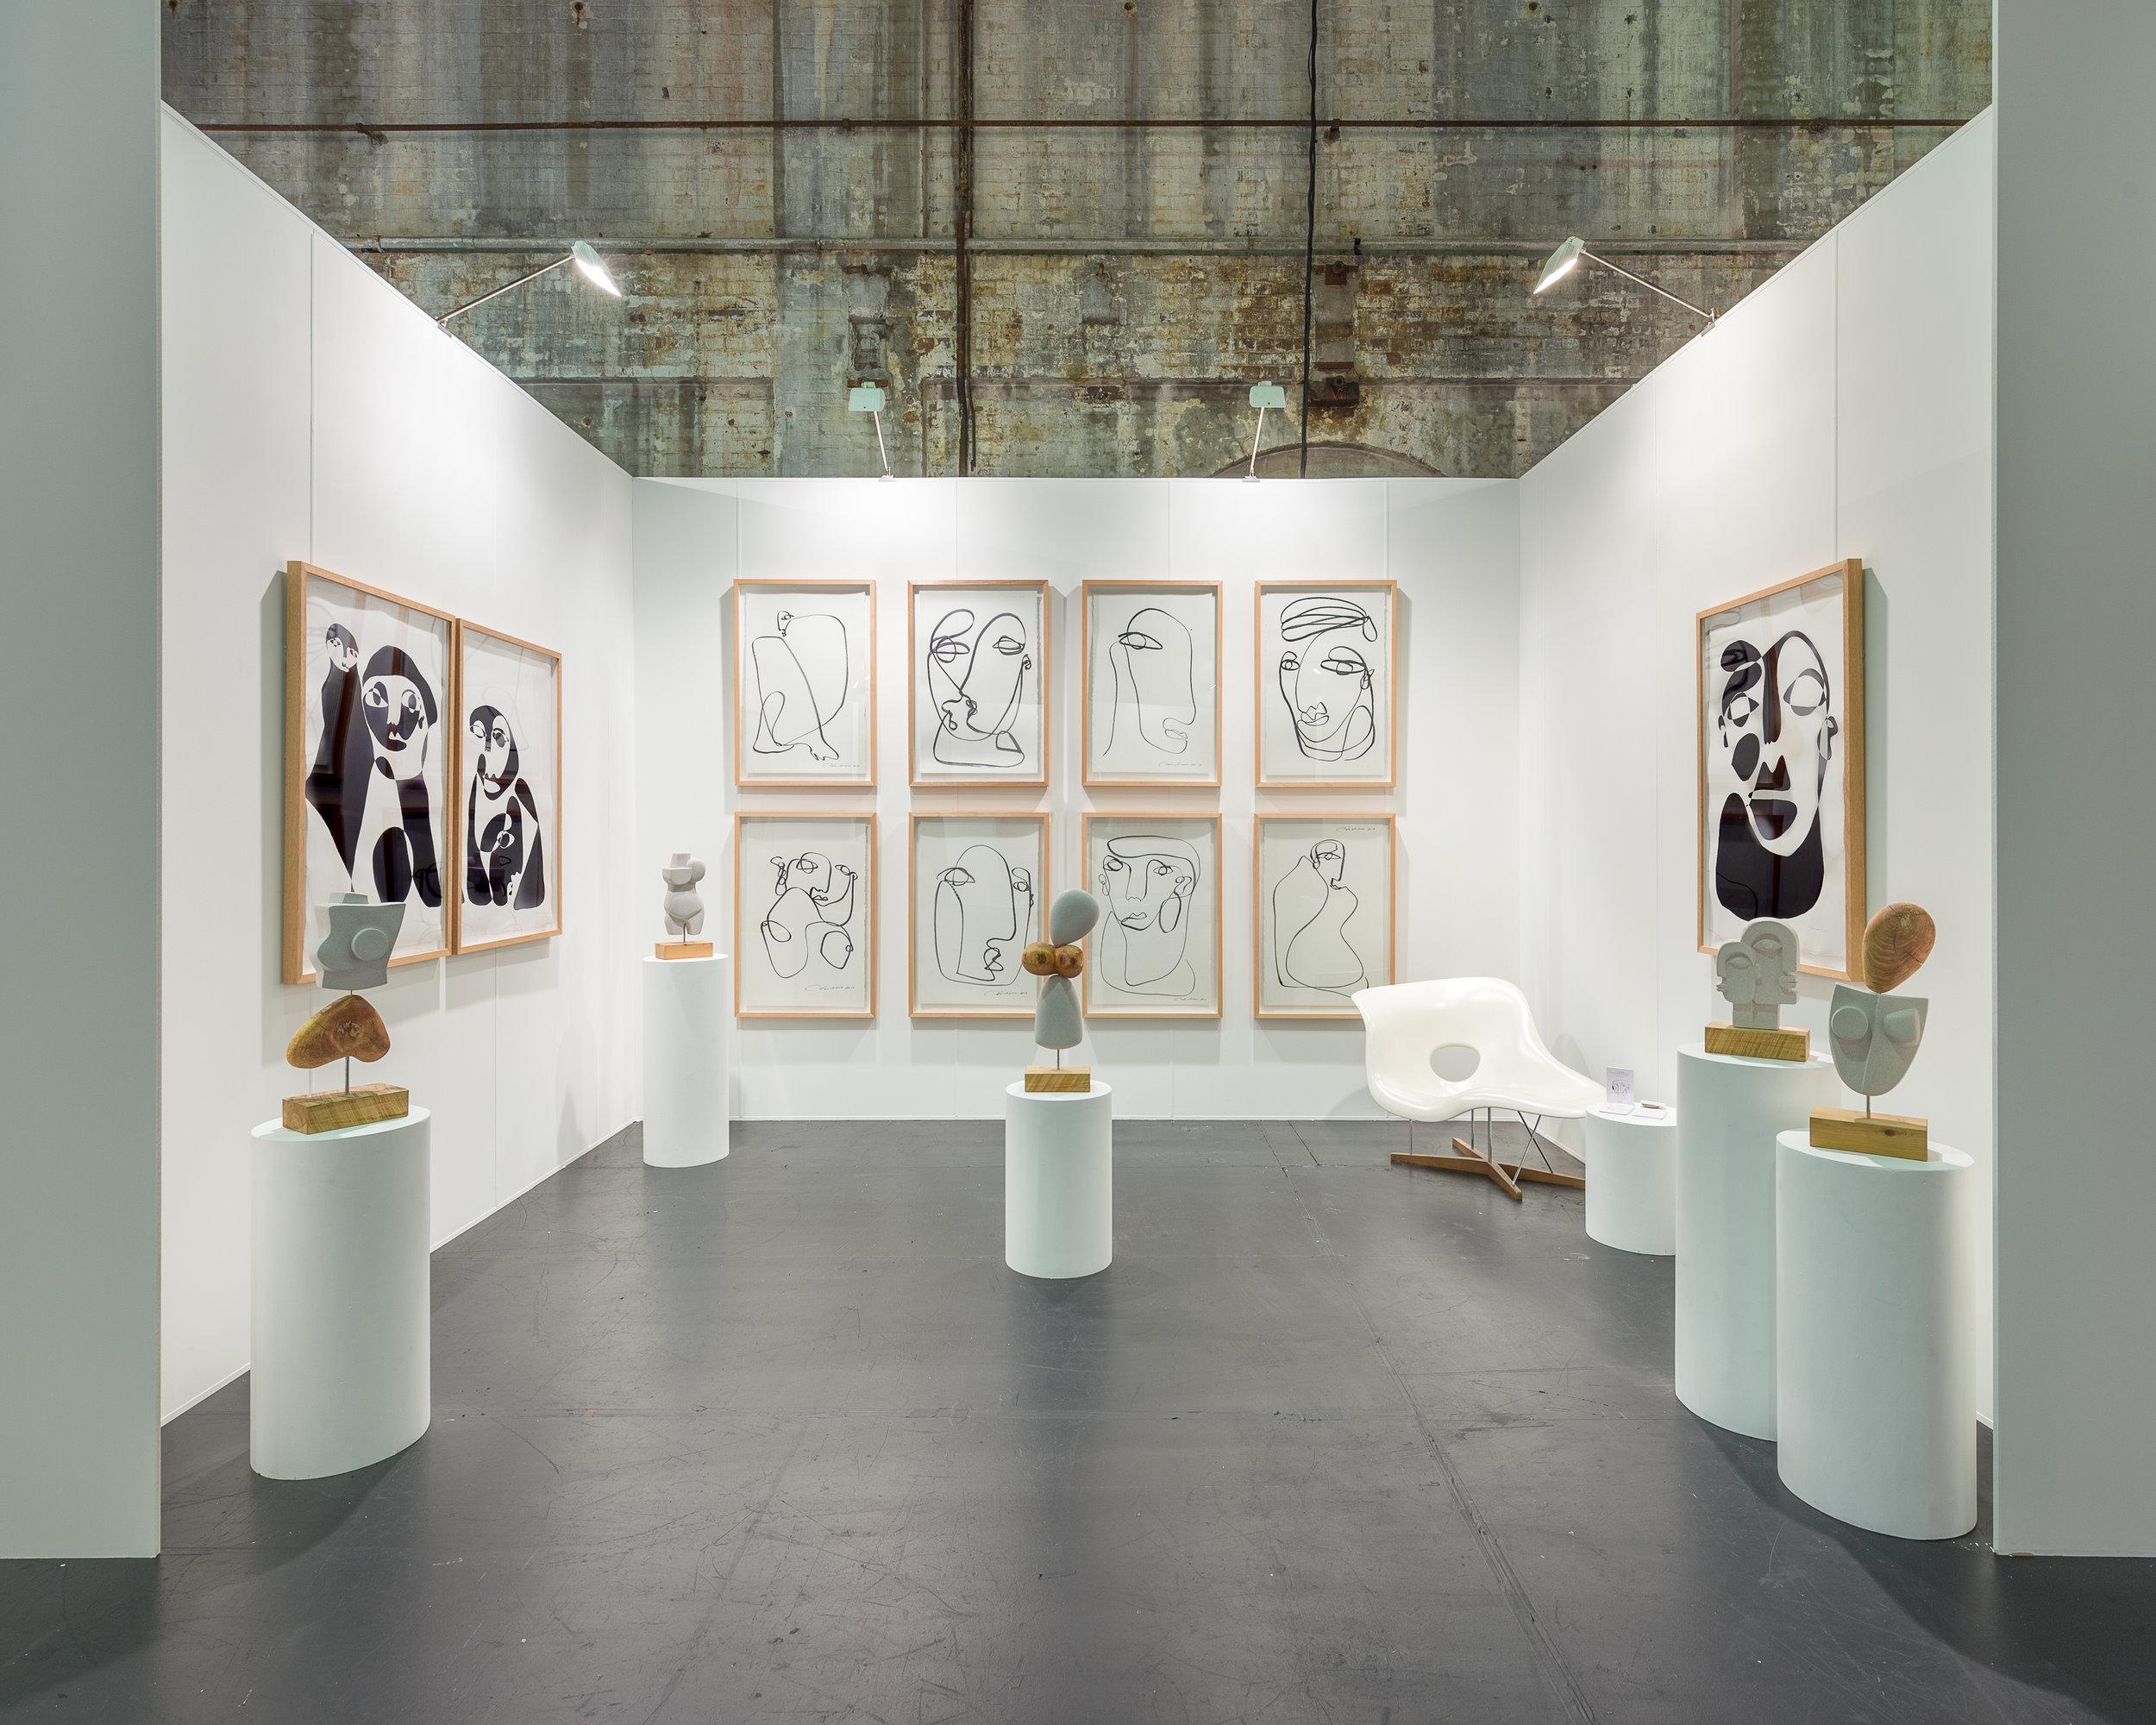 ART FAIR - 13TH SEPTEMBER - 16TH SEPTEMBER 2018SYDNEY CONTEMPORARY ART FAIR Artists: Christiane Spangsberg & Holly Ryan